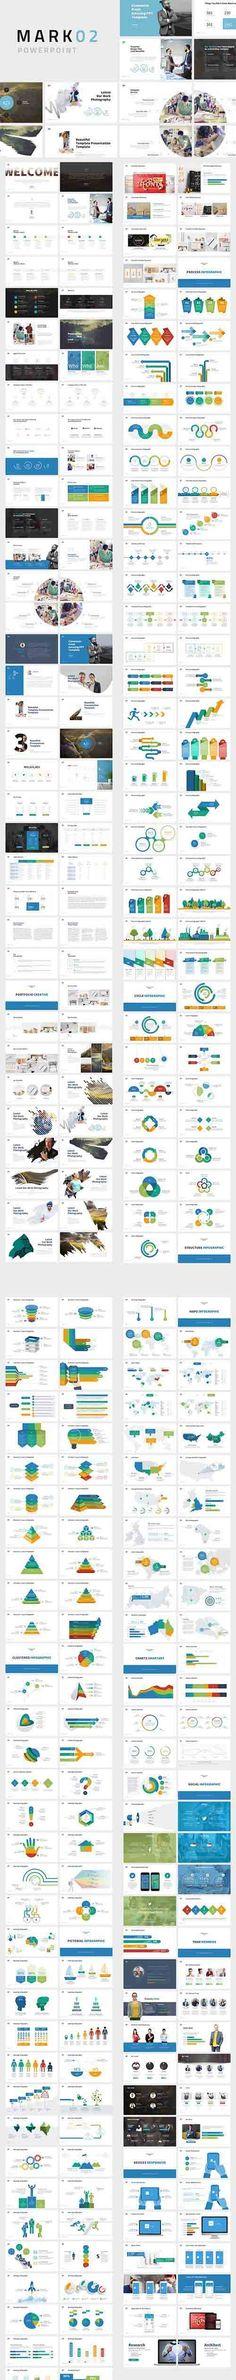 CreativeMarket - Mark02-Minimal Powerpoint Template